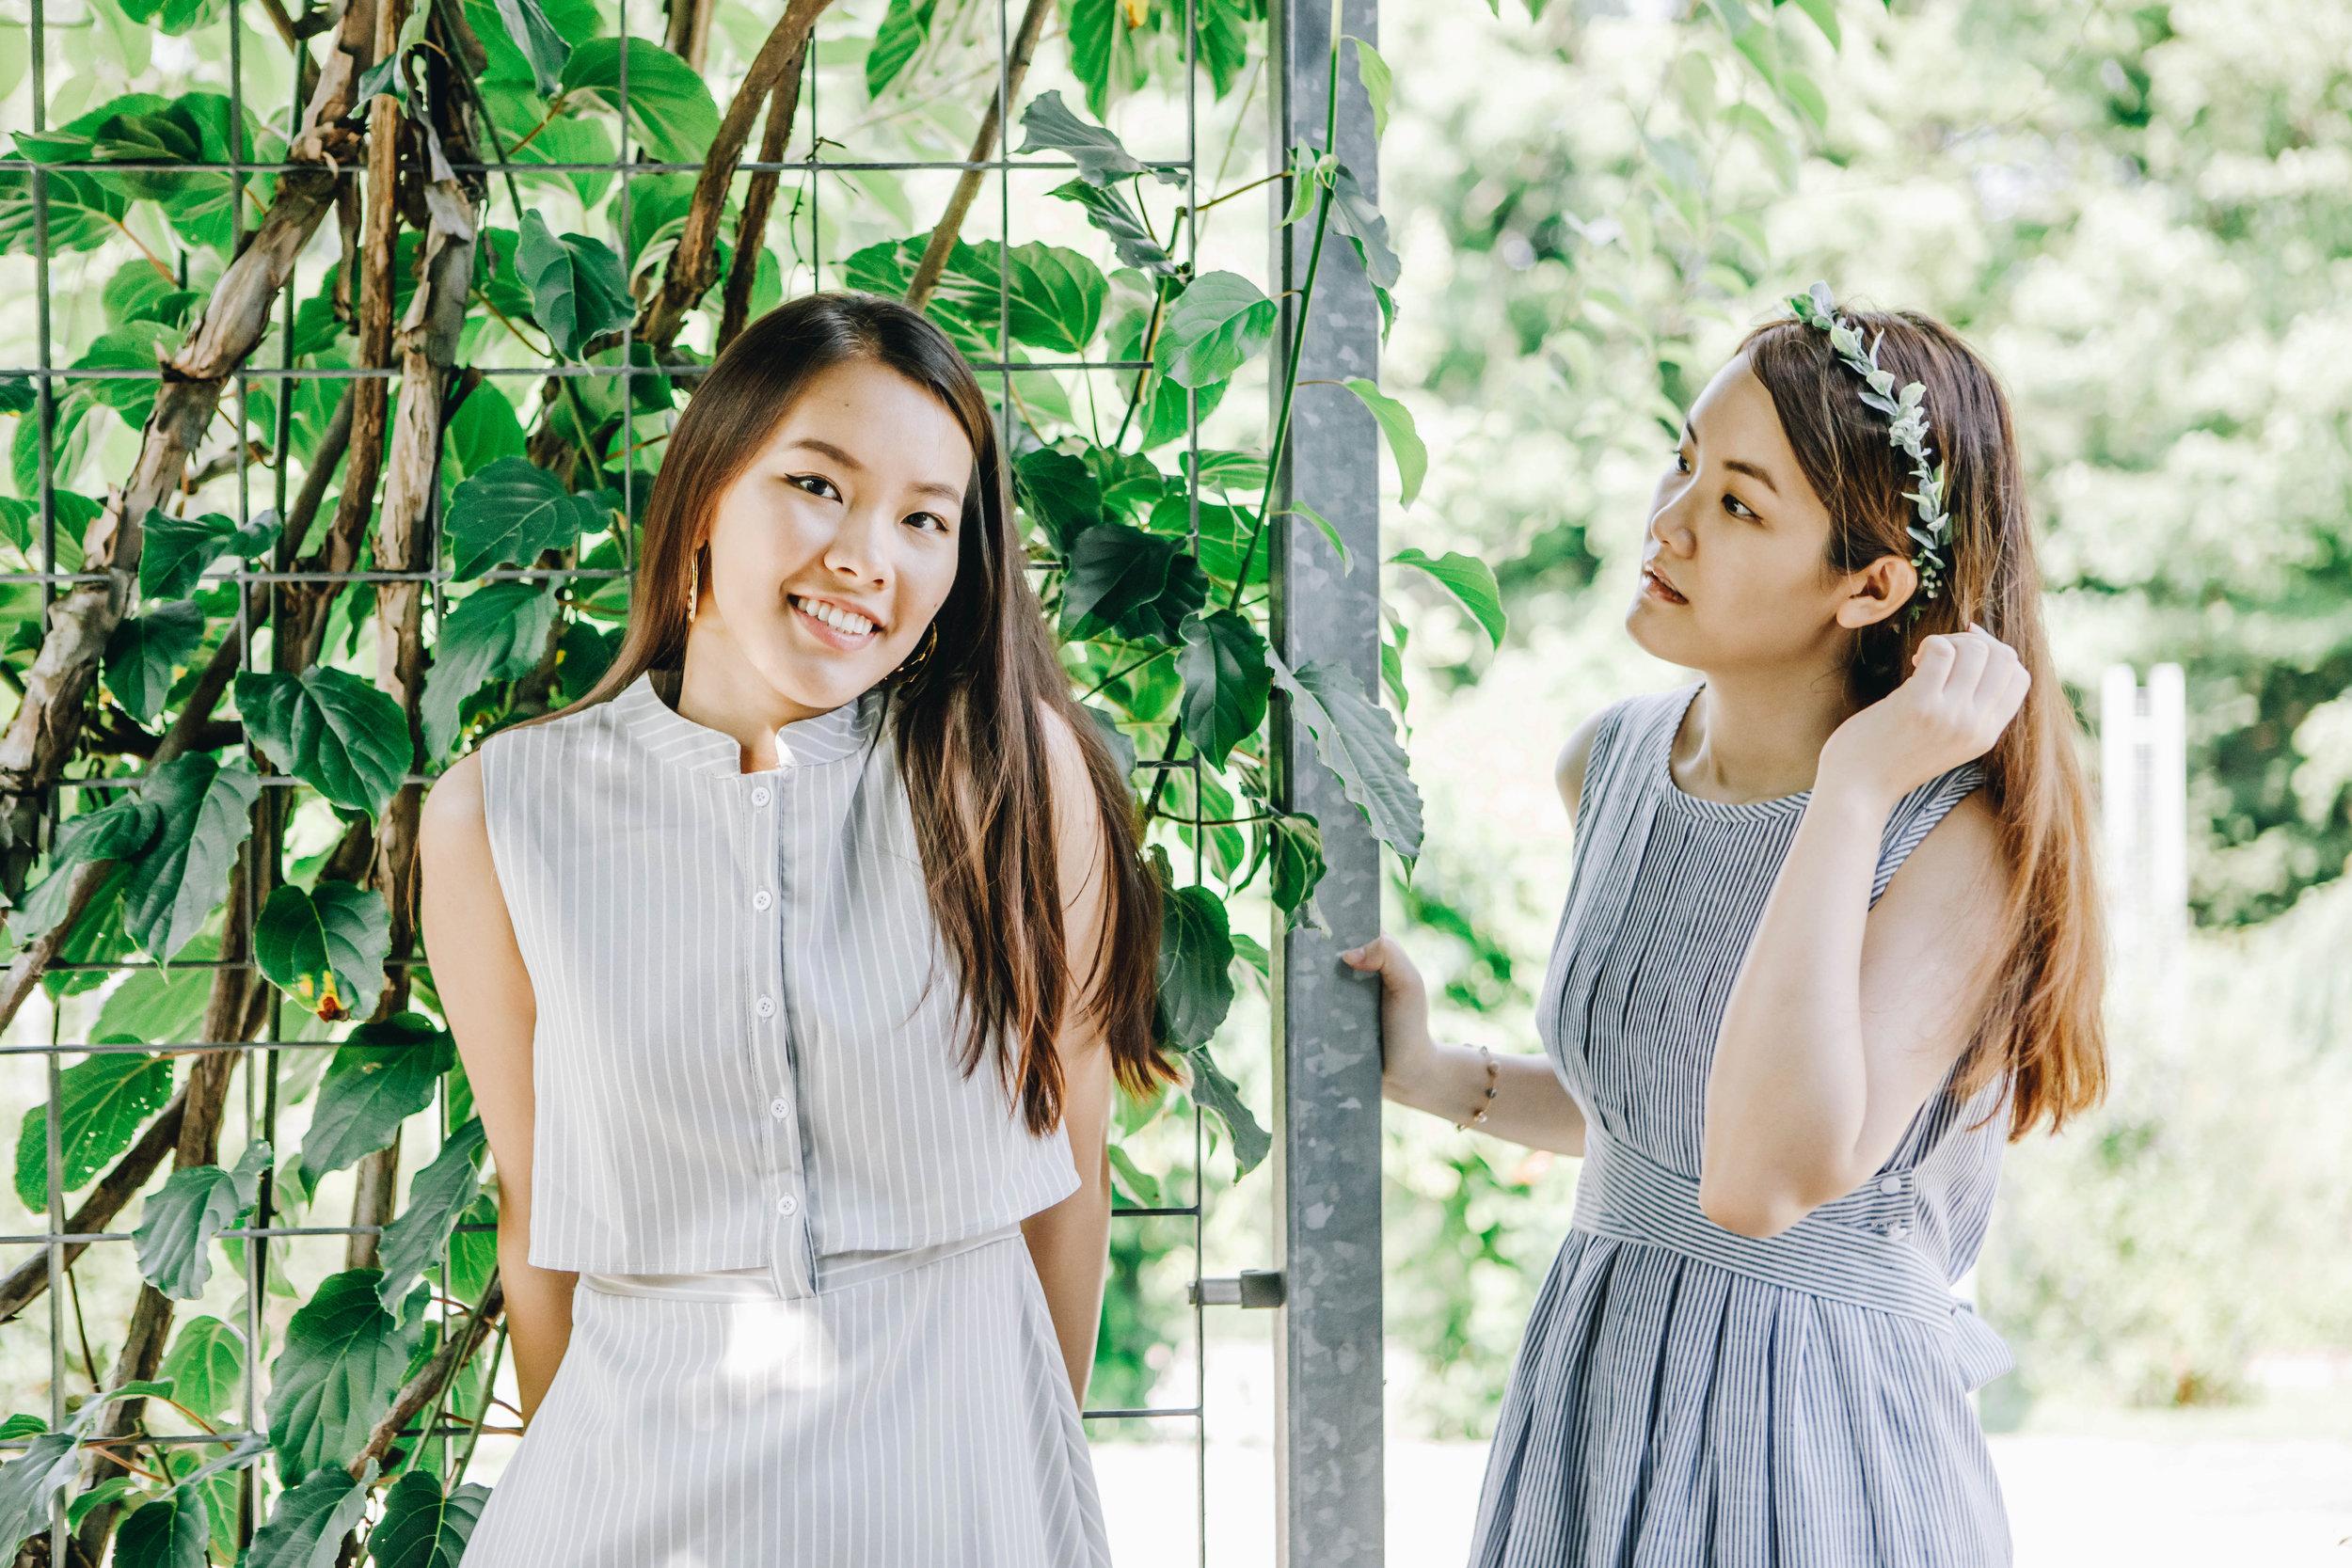 sisters-in-summertime-eva-loh-12.jpg